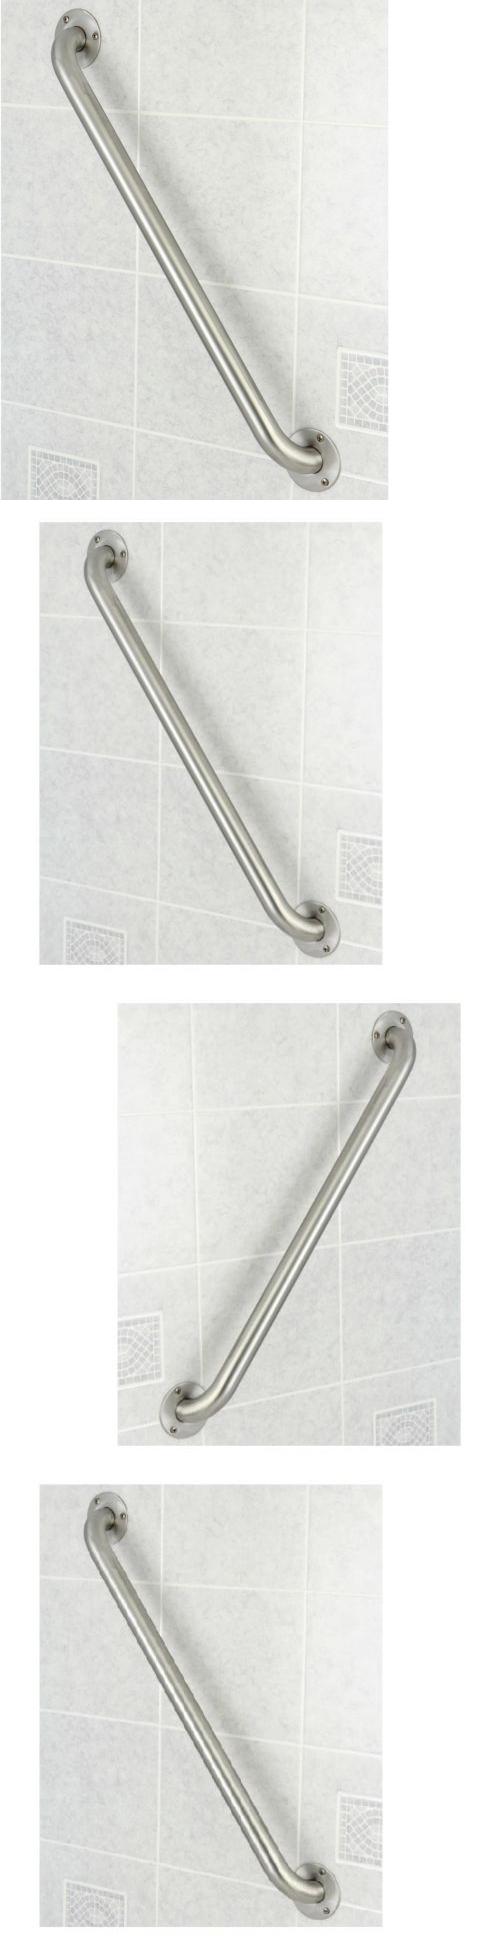 Handles And Rails: Bathroom Grab Bar Stainless Steel 24 Bath Shower Handicap  Safety Rail Handle